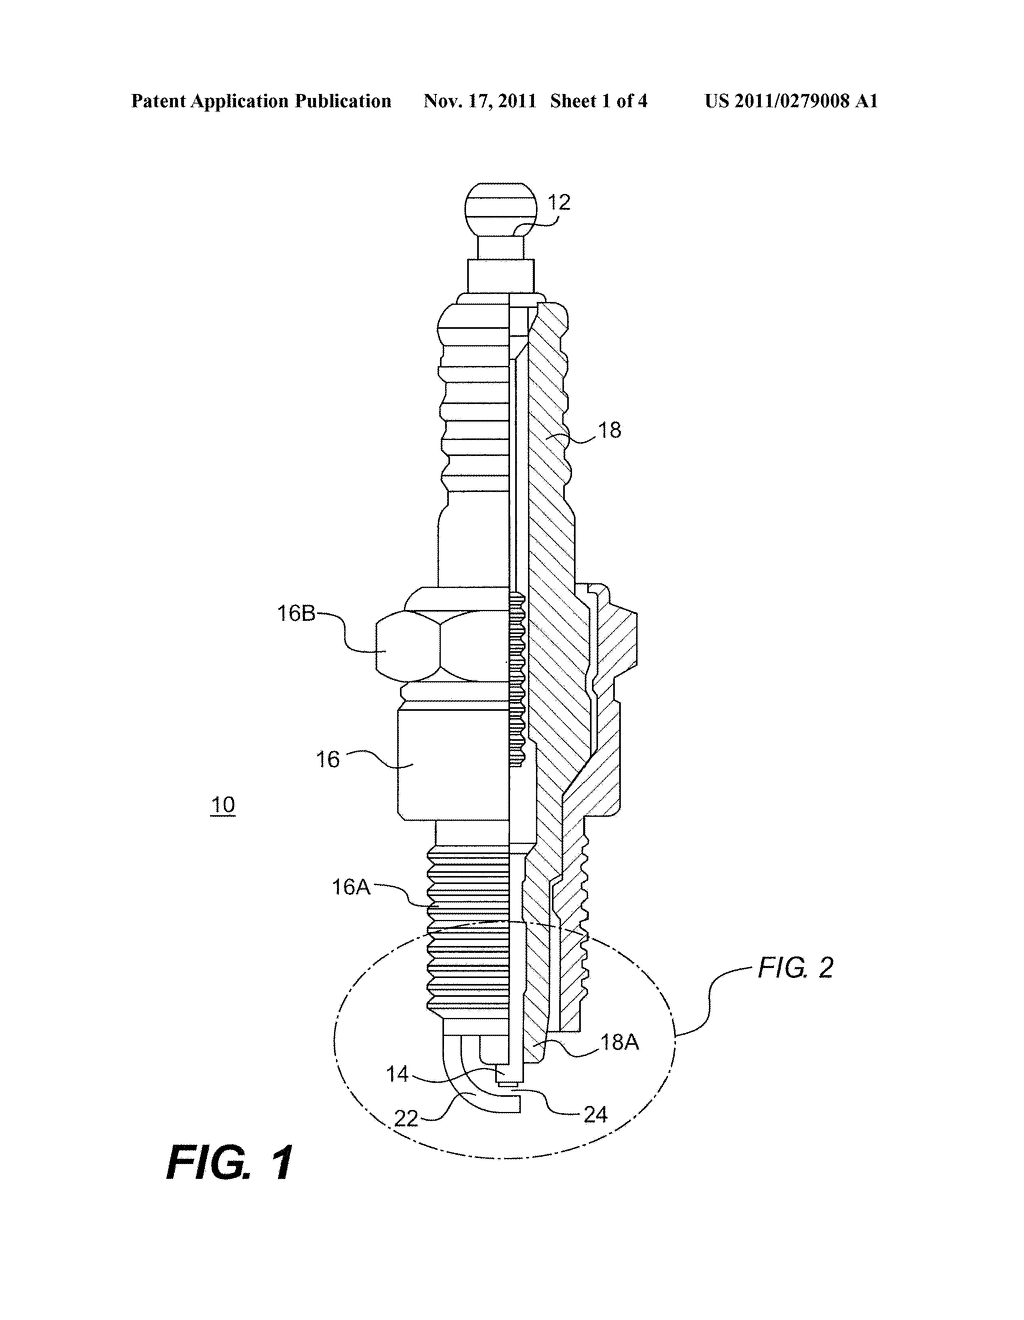 medium resolution of spark plug diagram schematic and image 02 tattoos diagram spark plug diagram schematic